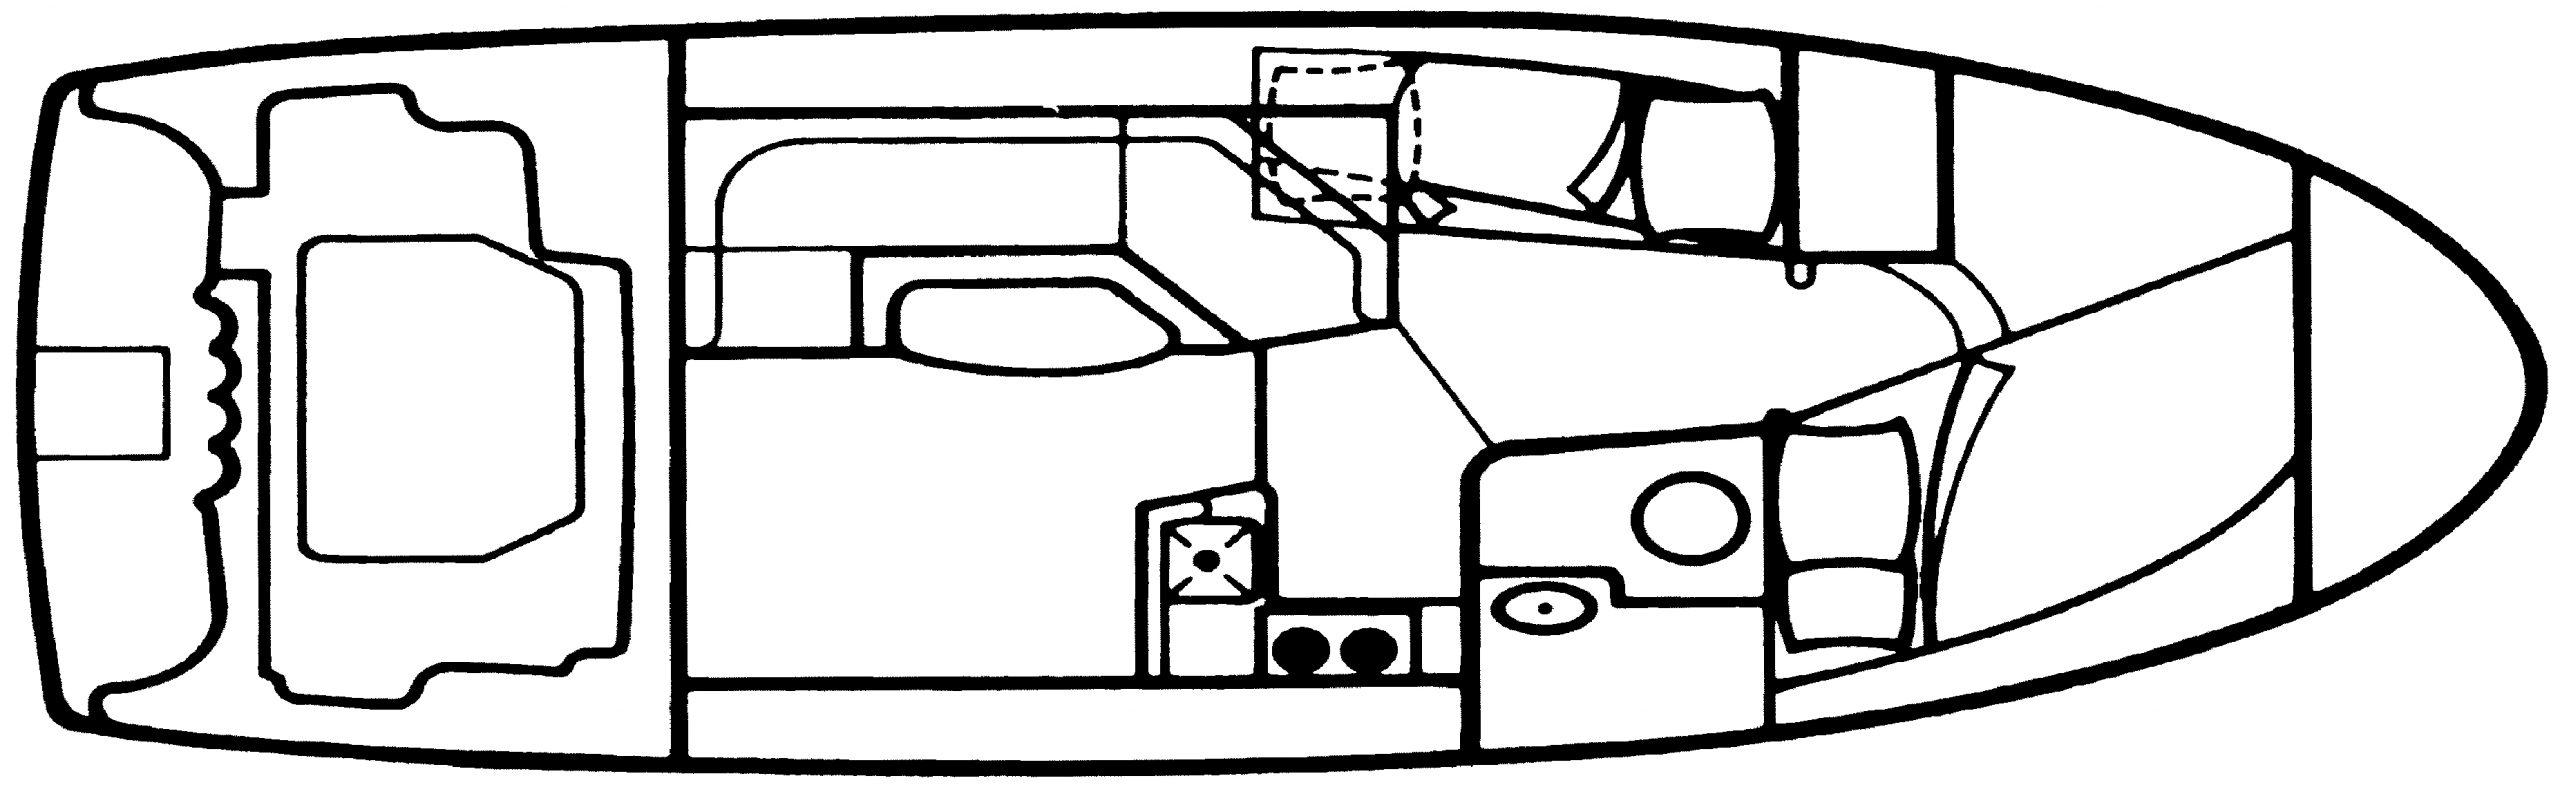 312 Sedan Cruiser Floor Plan 1